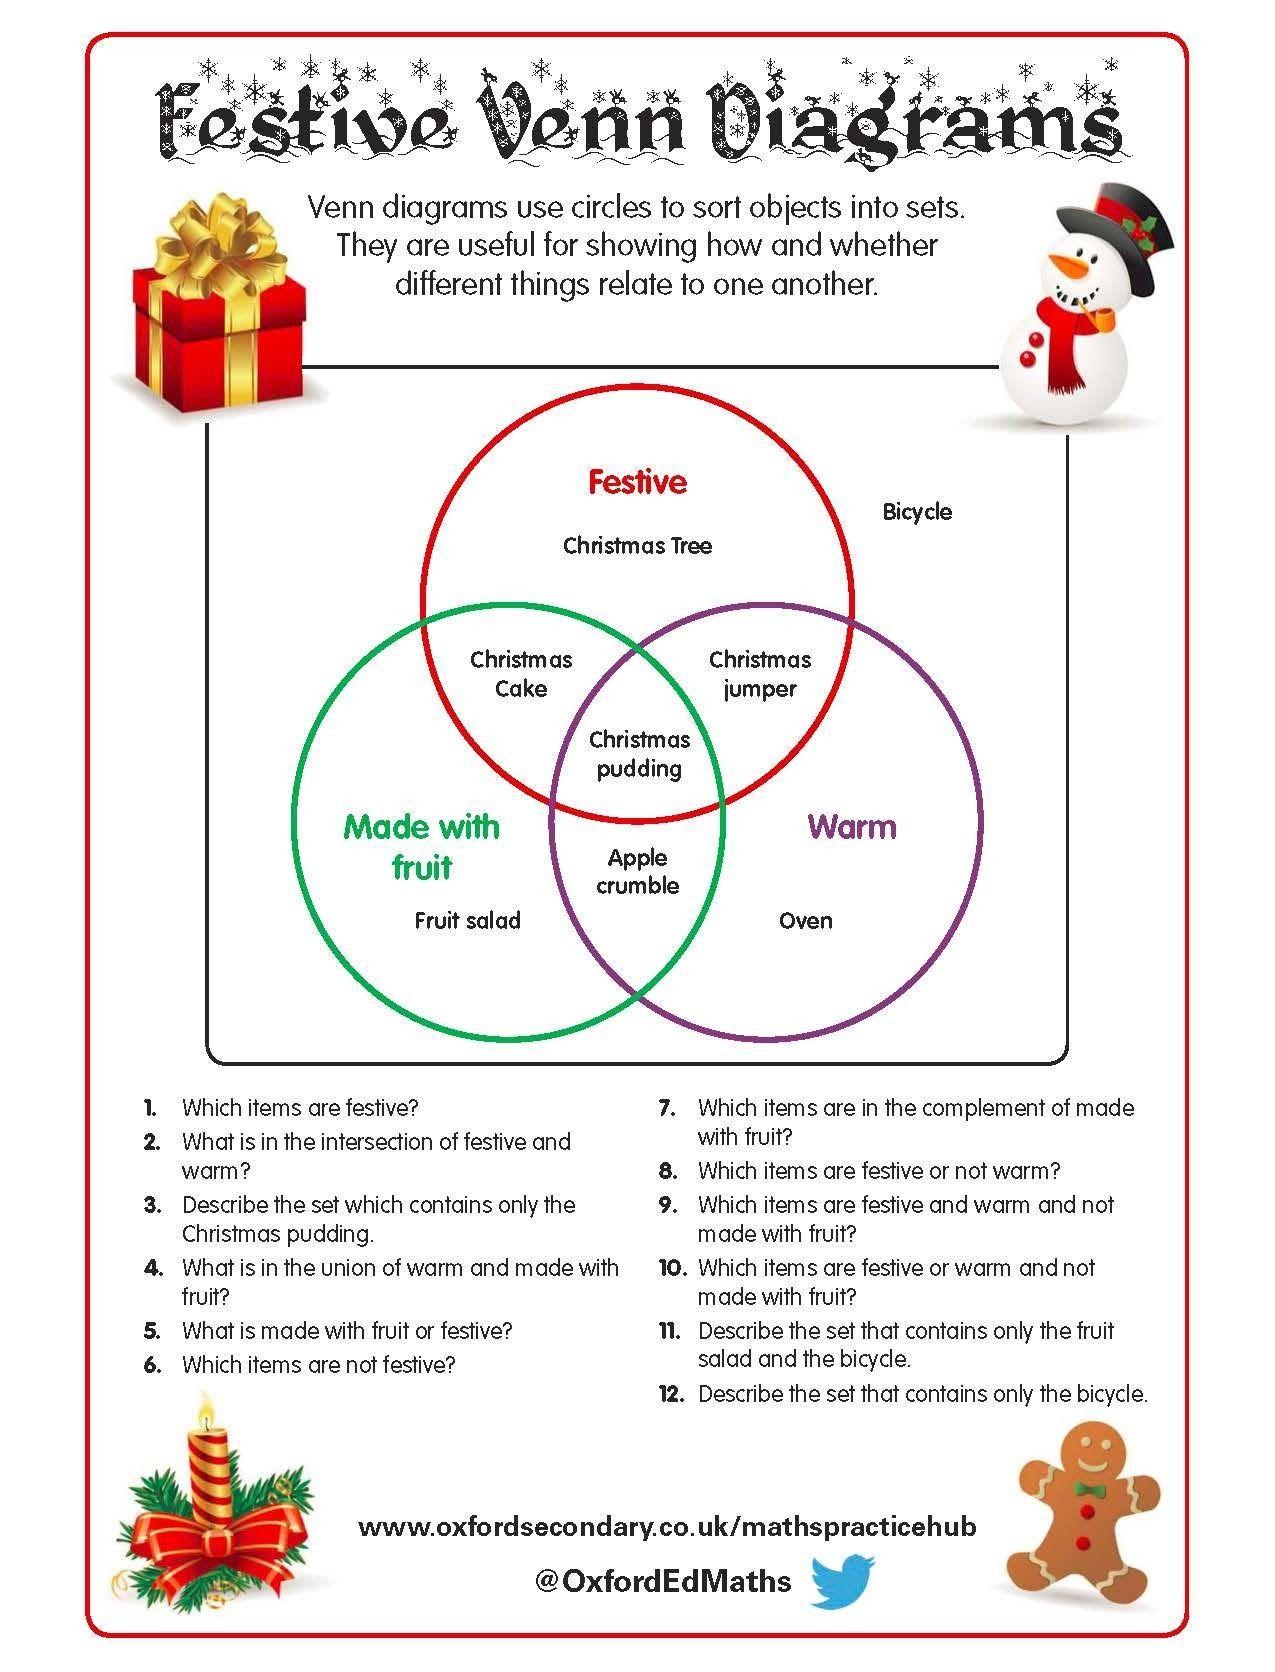 4 Worksheet Reading Venn Diagrams 3 Dessert This Christmas Themed Worksheet Features Venn Dia Christmas Math Worksheets Venn Diagram Venn Diagram Worksheet [ 1672 x 1275 Pixel ]